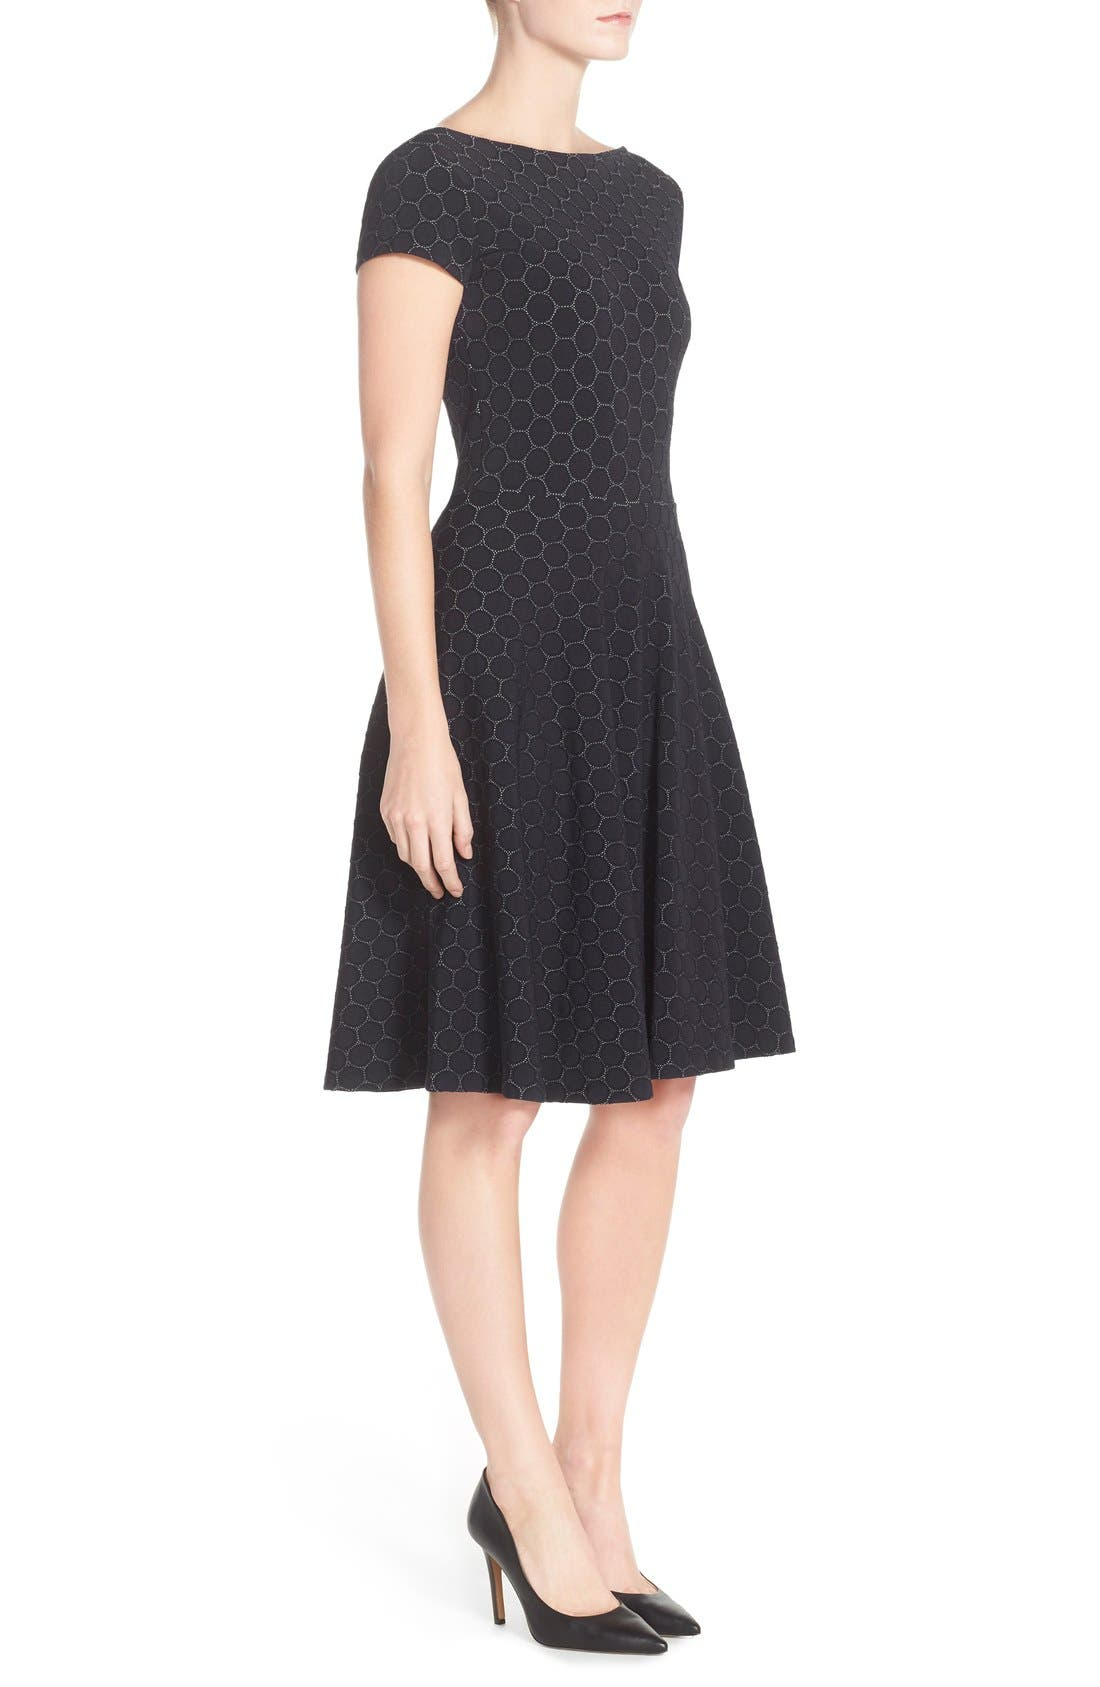 LEOTA, 'Circle' Jacquard Woven Jersey Dress, Alternate thumbnail 6, color, BLACK CAMEO CLOTH